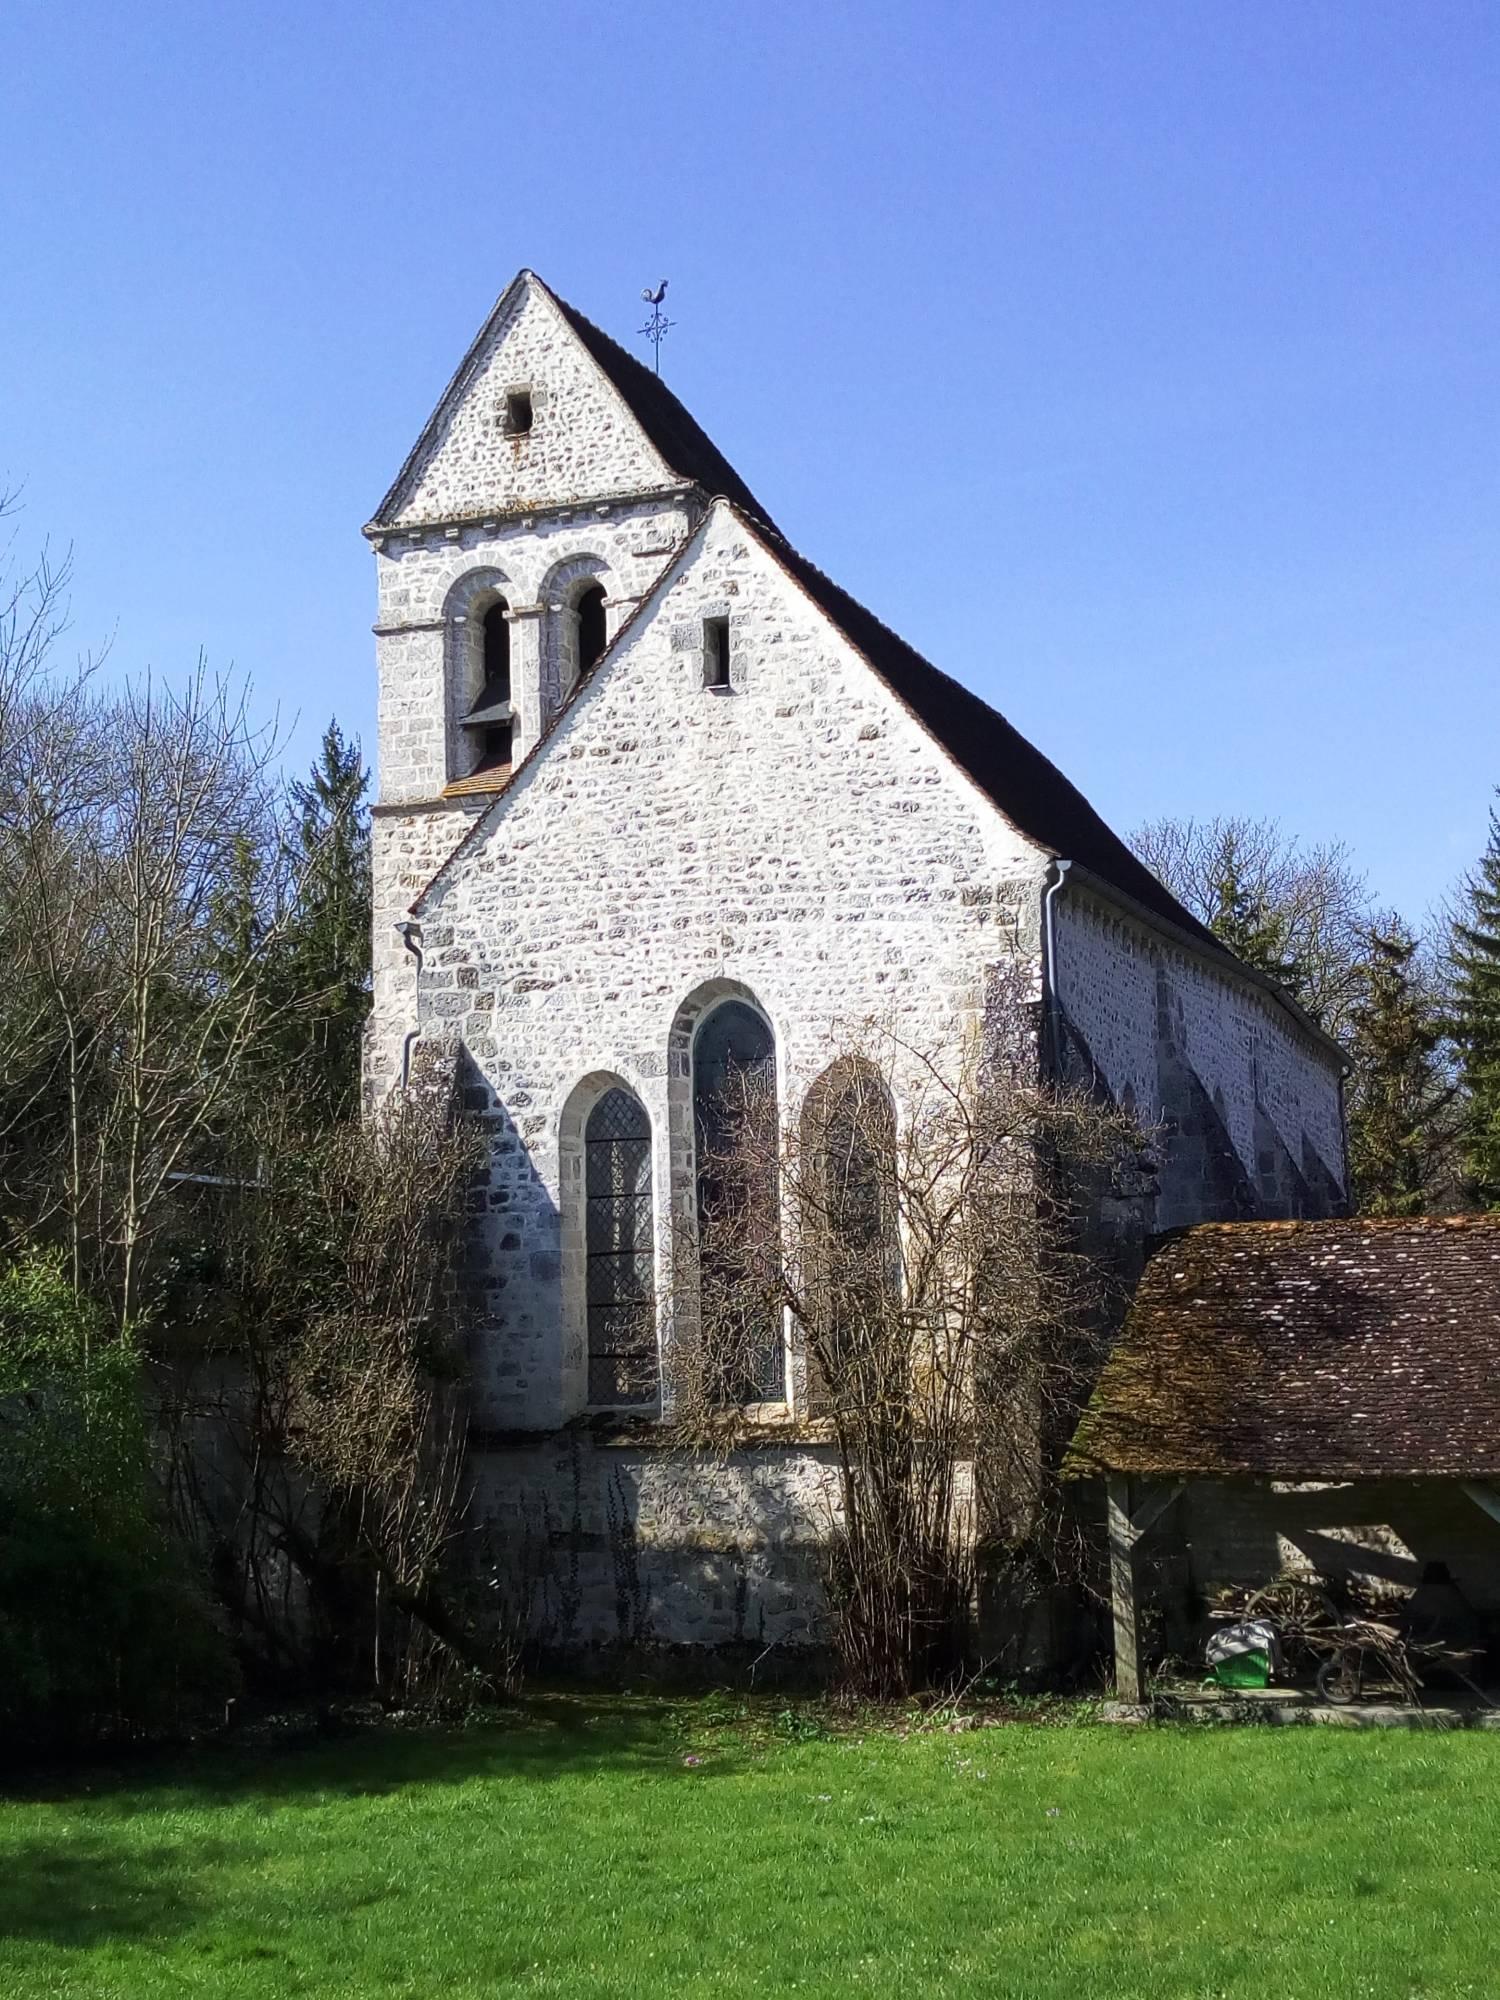 Gaubertin (45) Eglise Saint-Aubin - Fondation La Sauvegarde de l'Art Français